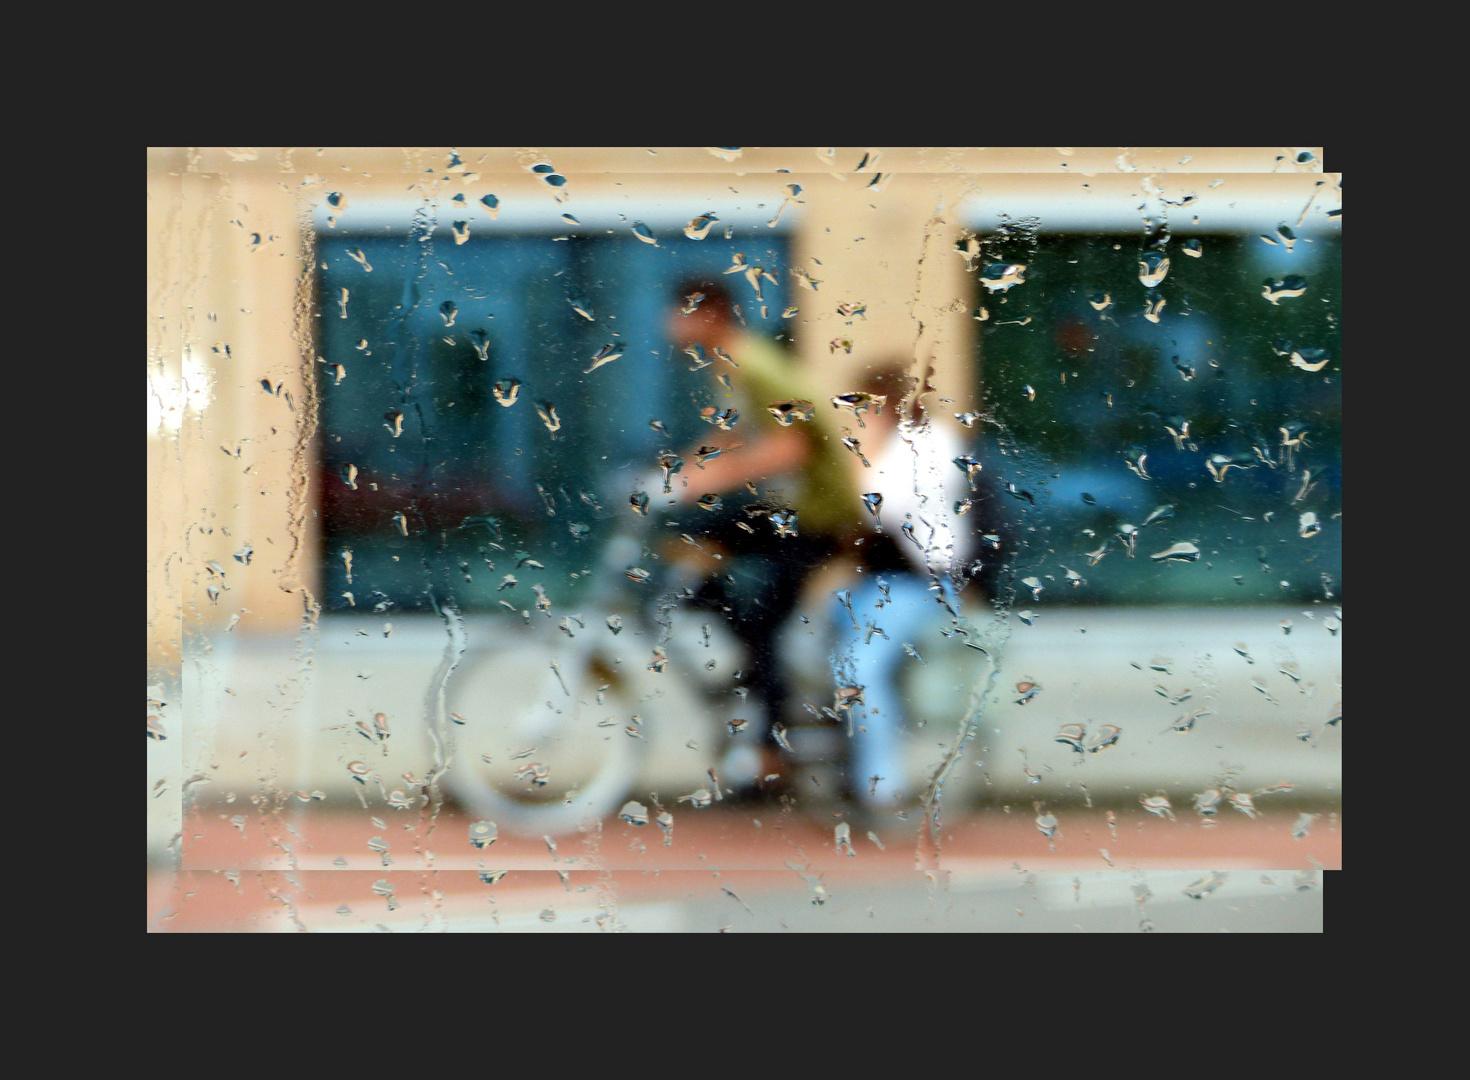 ... it began to rain